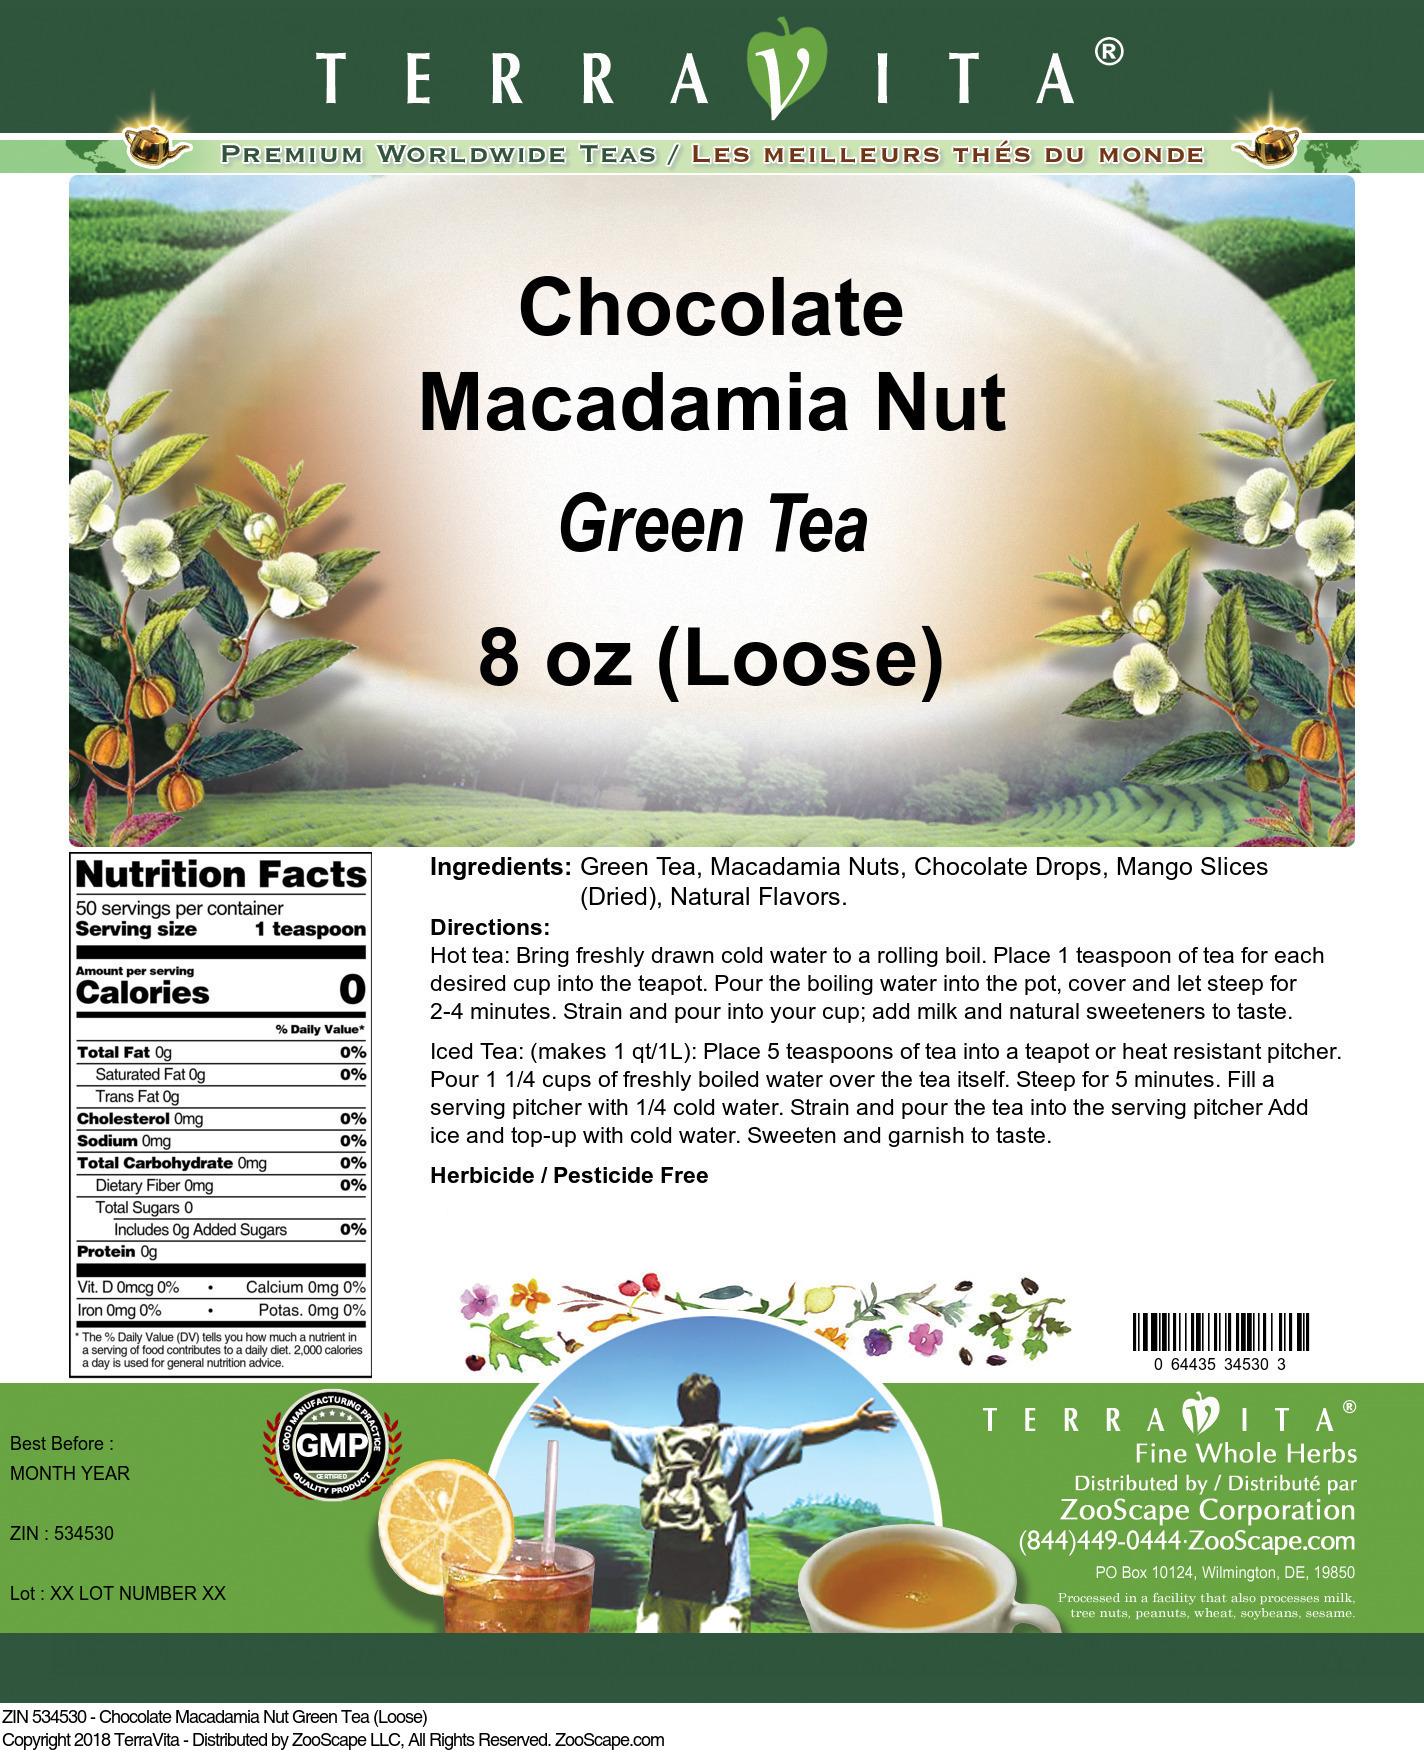 Chocolate Macadamia Nut Green Tea